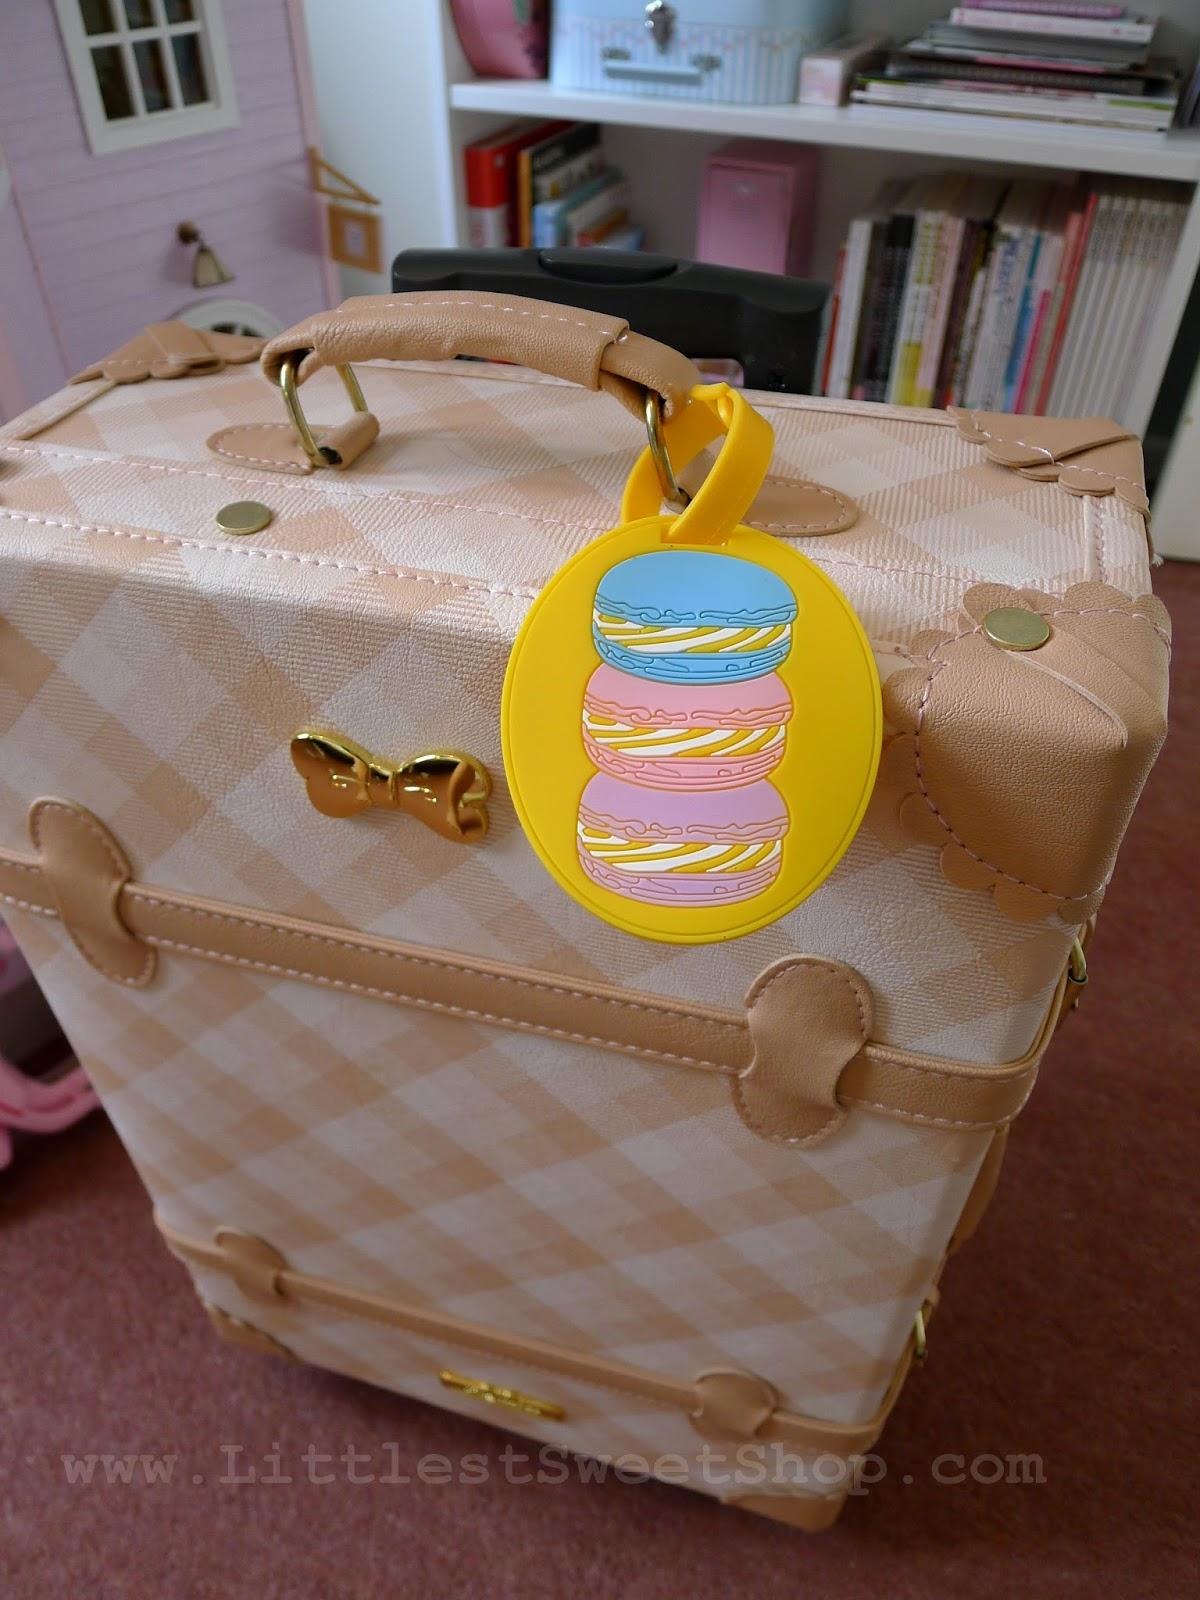 Littlest Sweet Shop Blippo Fukubukuro Review And Giveaway Luggage Tag Pikachu Macaron